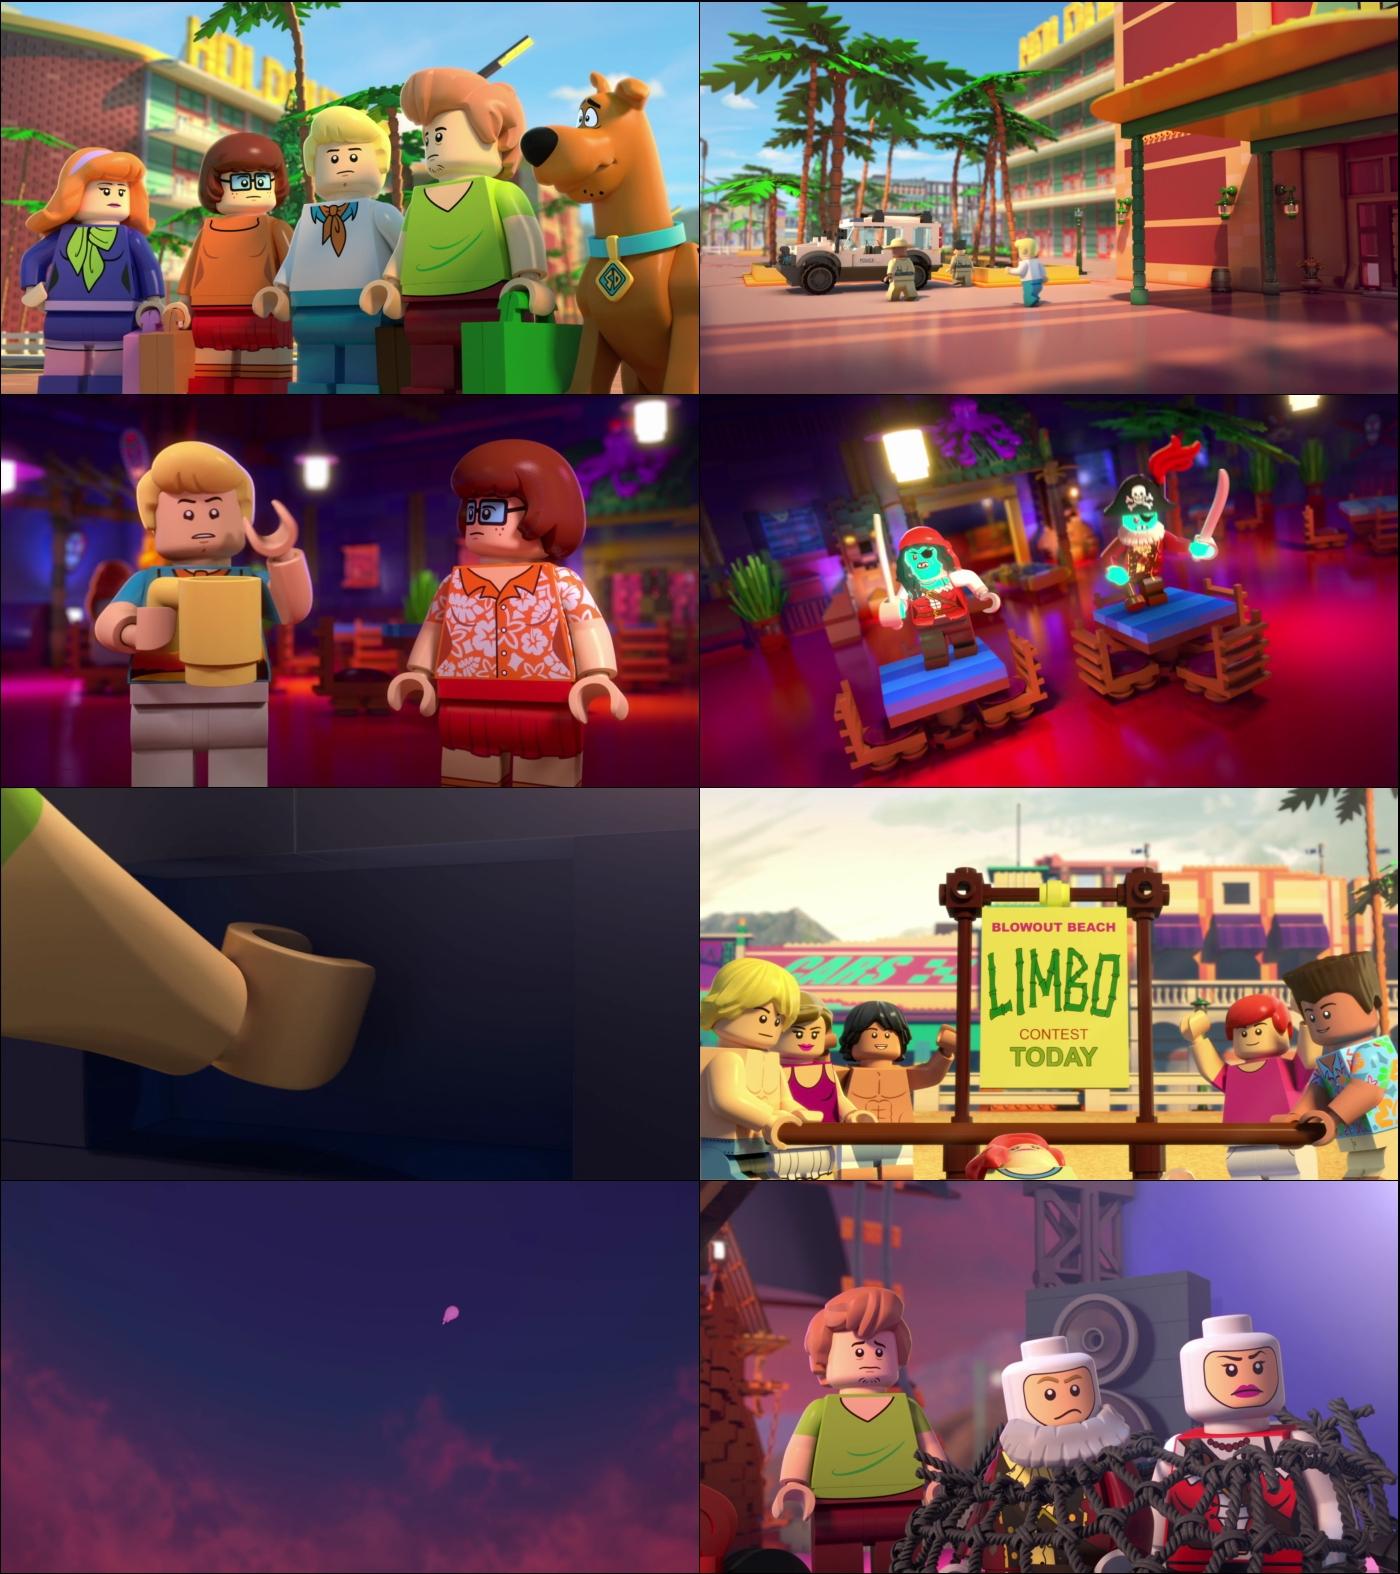 Lego Scooby Doo Fiesta en la playa de Blowout 1080p Latino